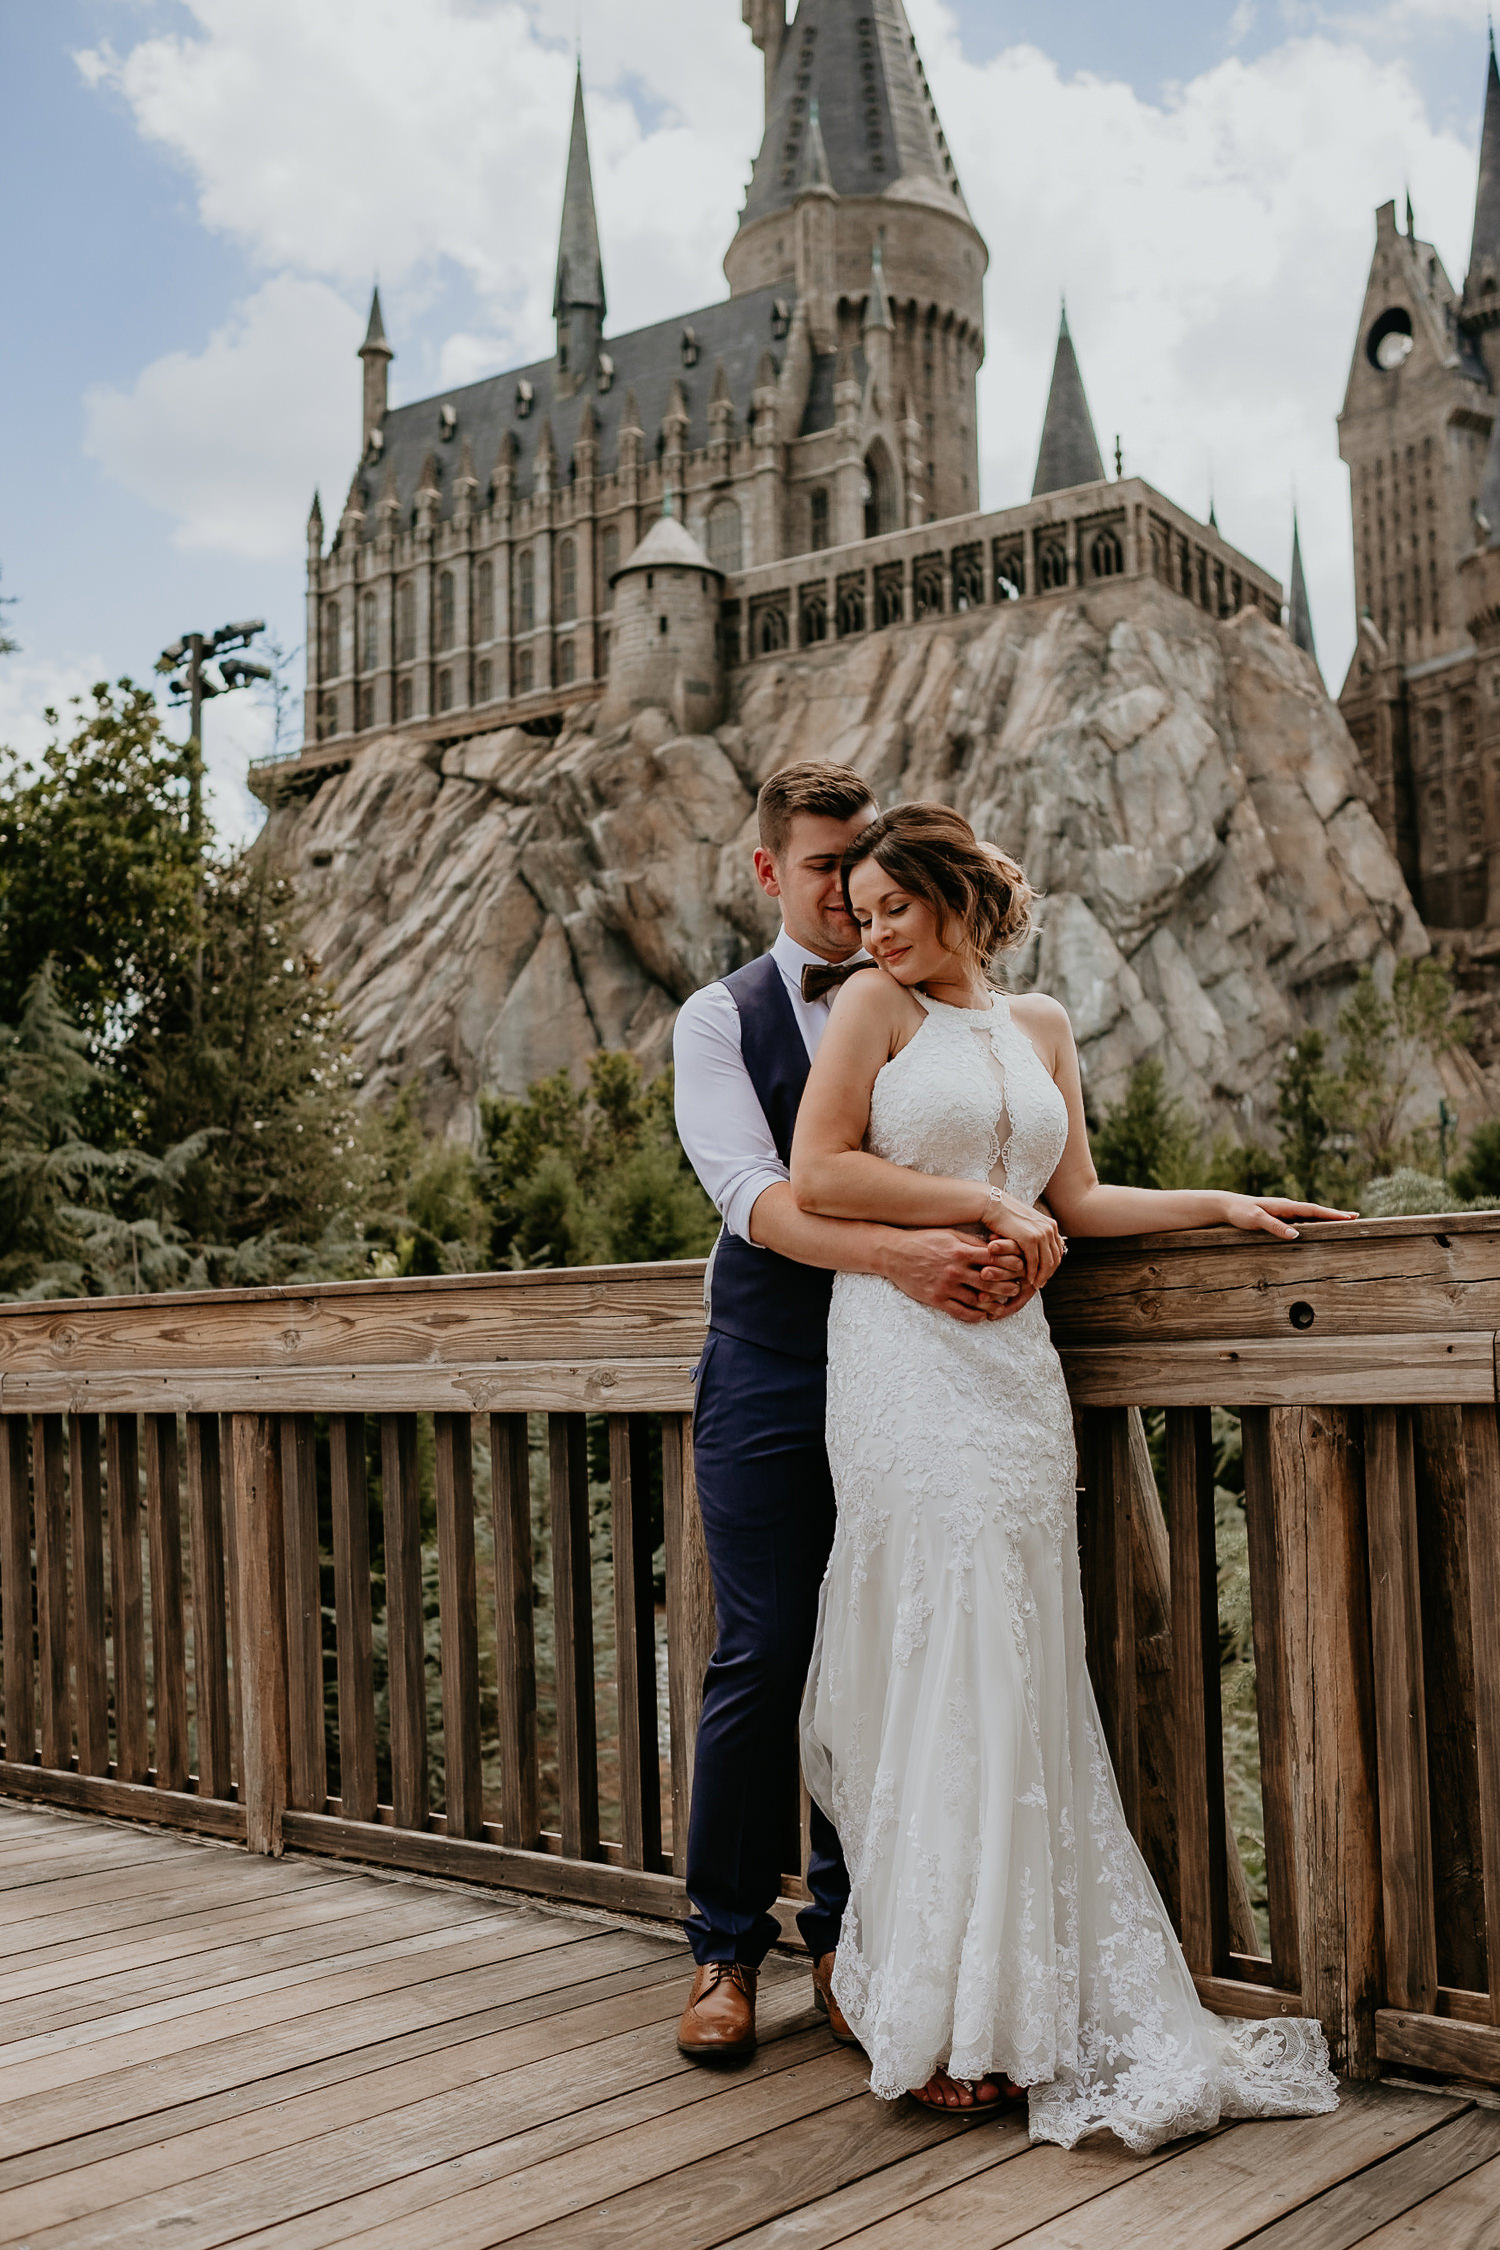 groom hugging bride from behind on bridge in front of hogwarts castle